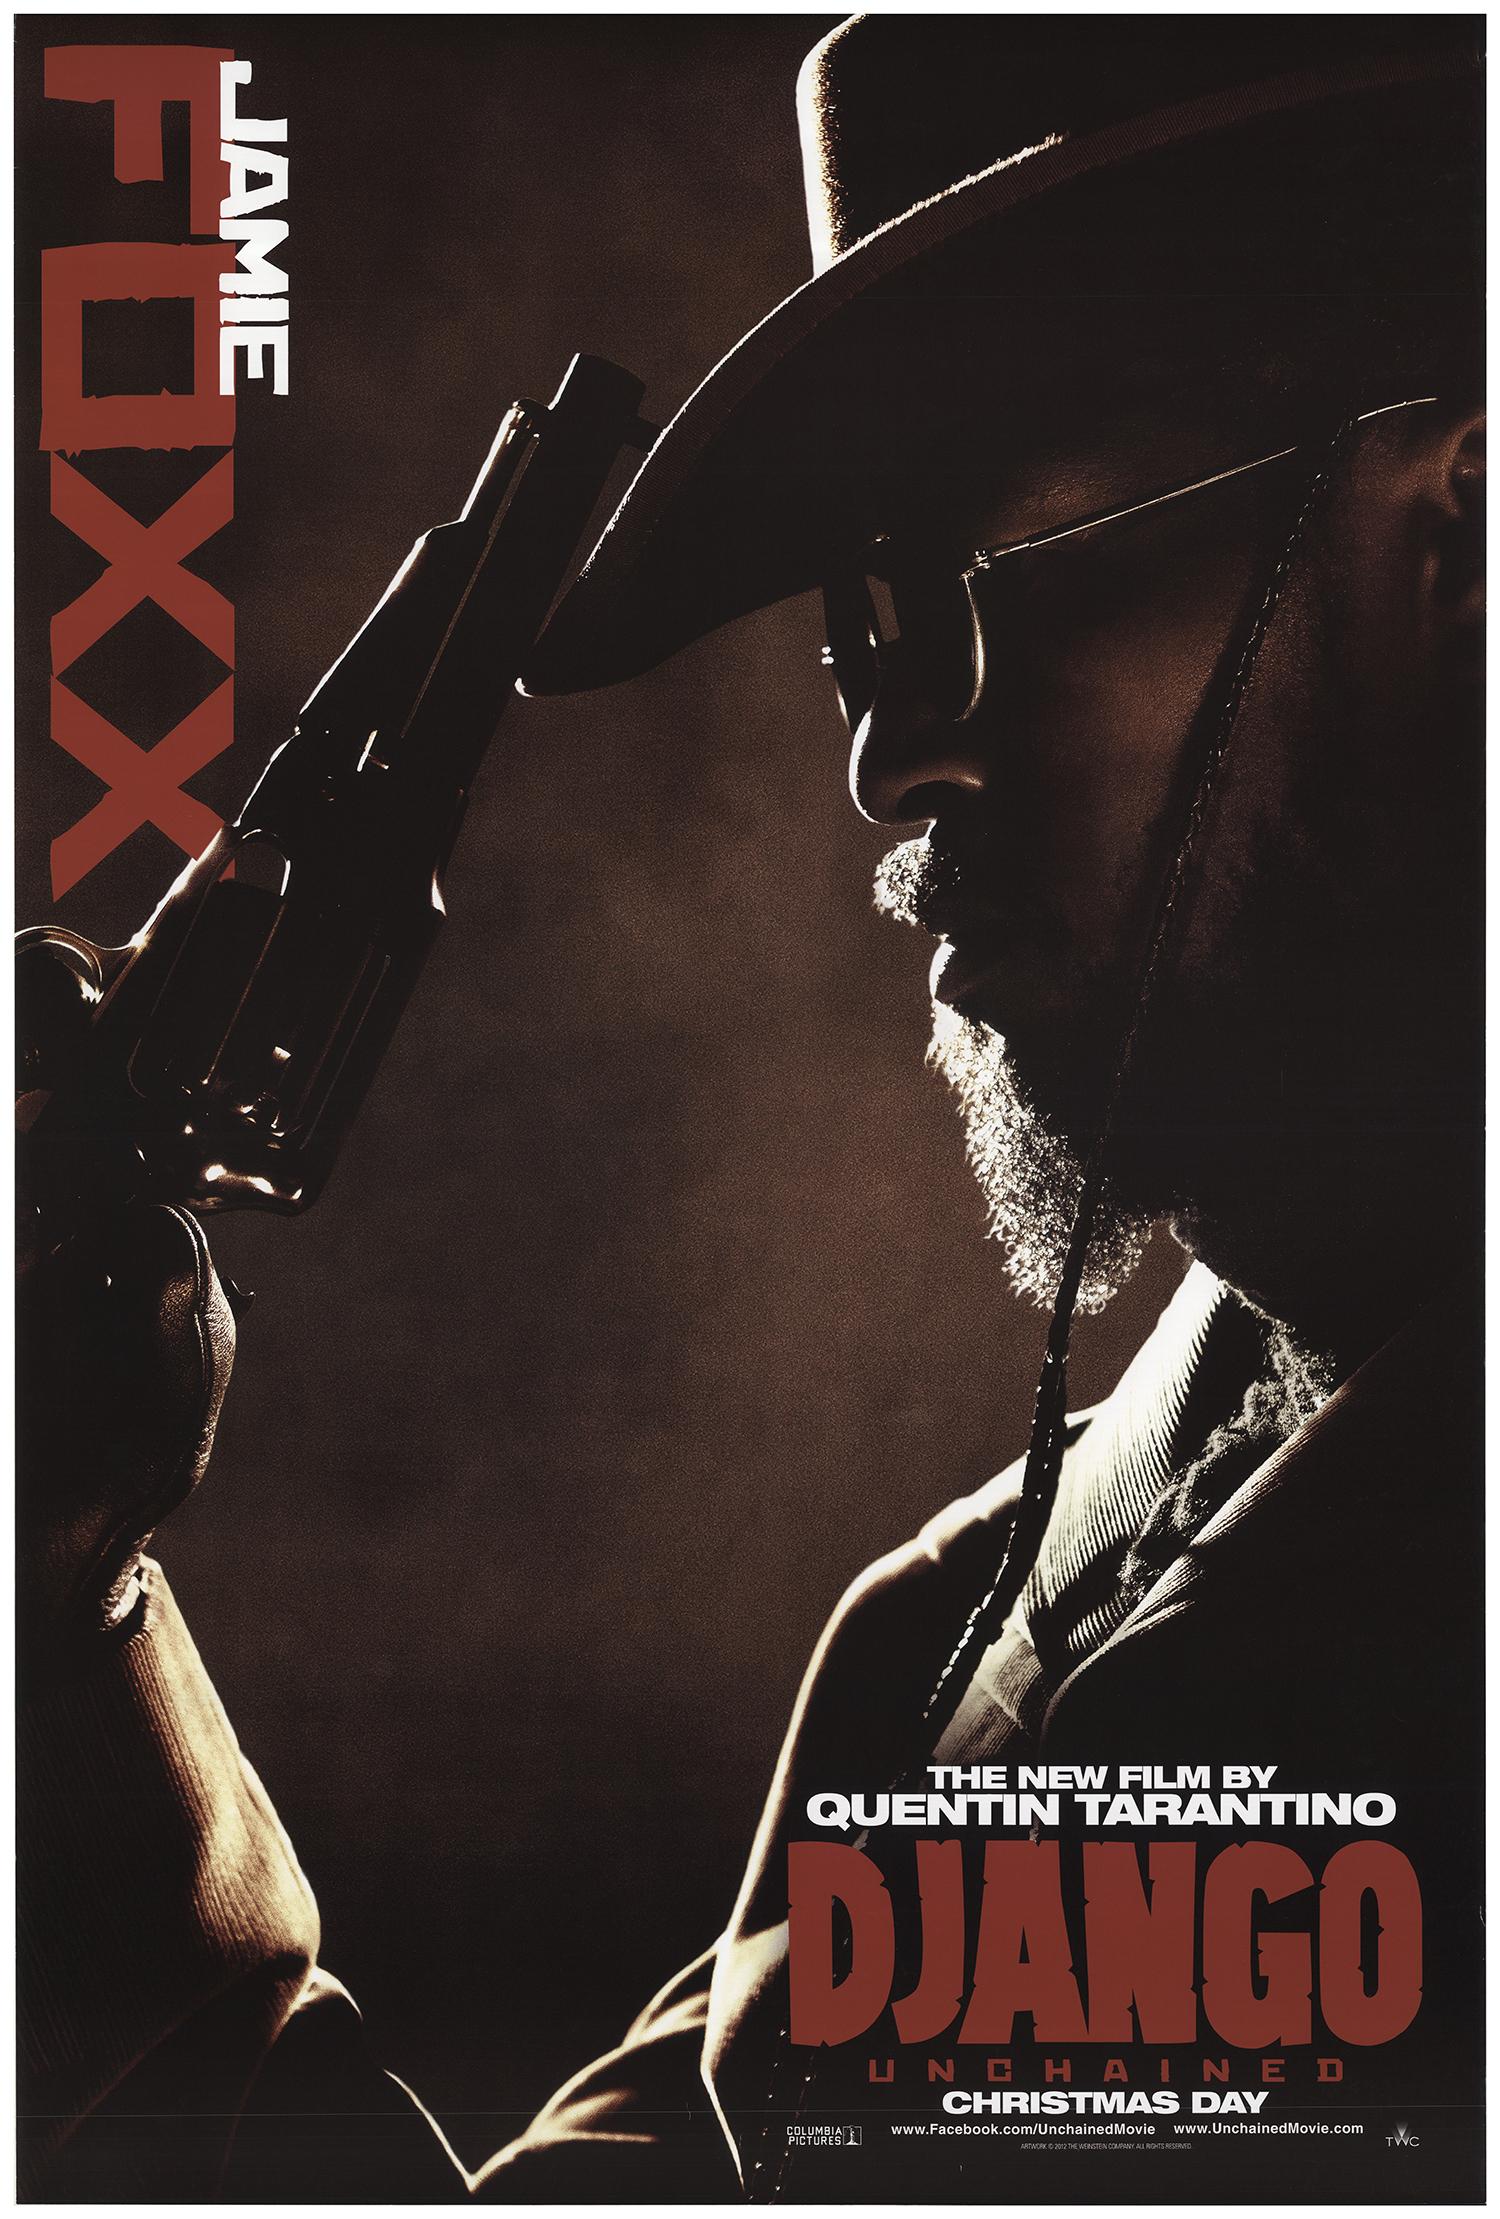 Django Unchained 2012 Original Movie Poster Fff 74167 Fffmovieposters Com